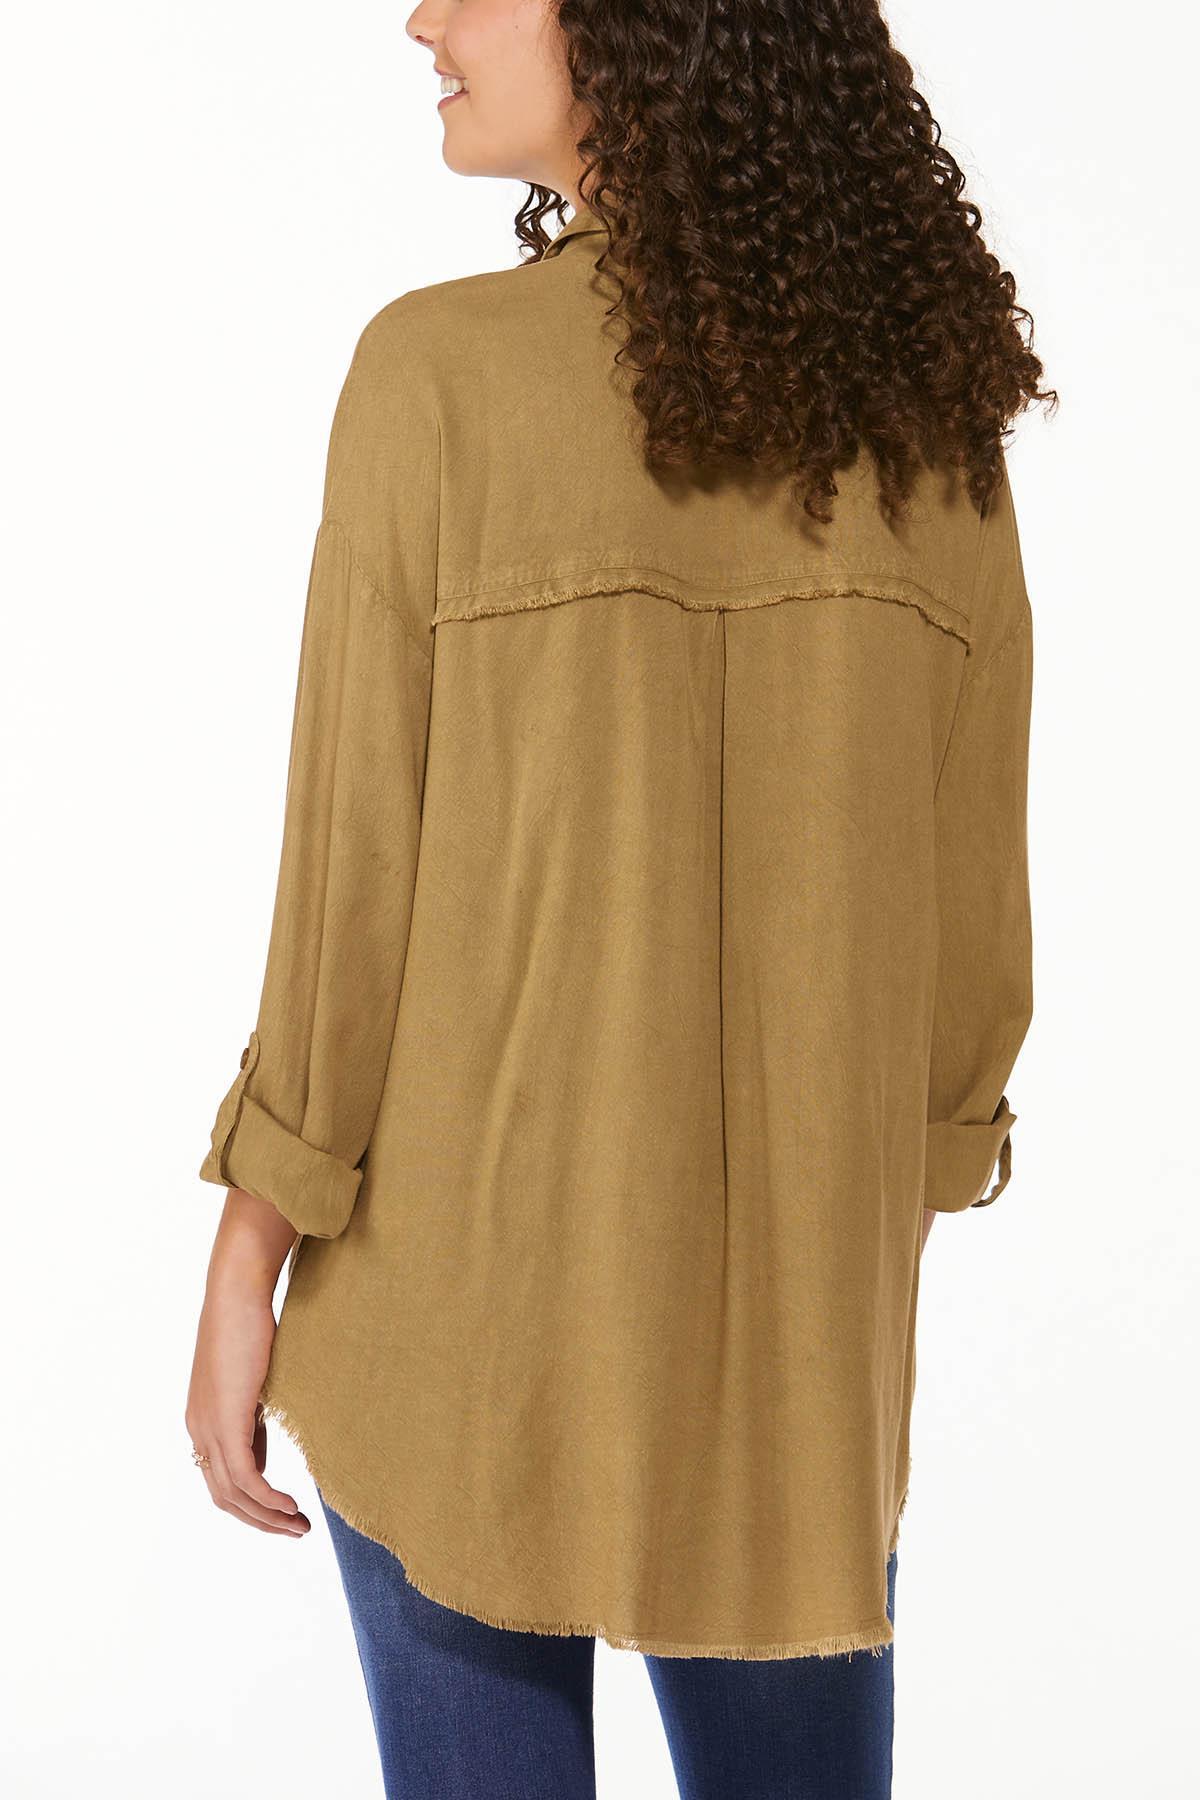 Frayed High-Low Tunic (Item #44692075)